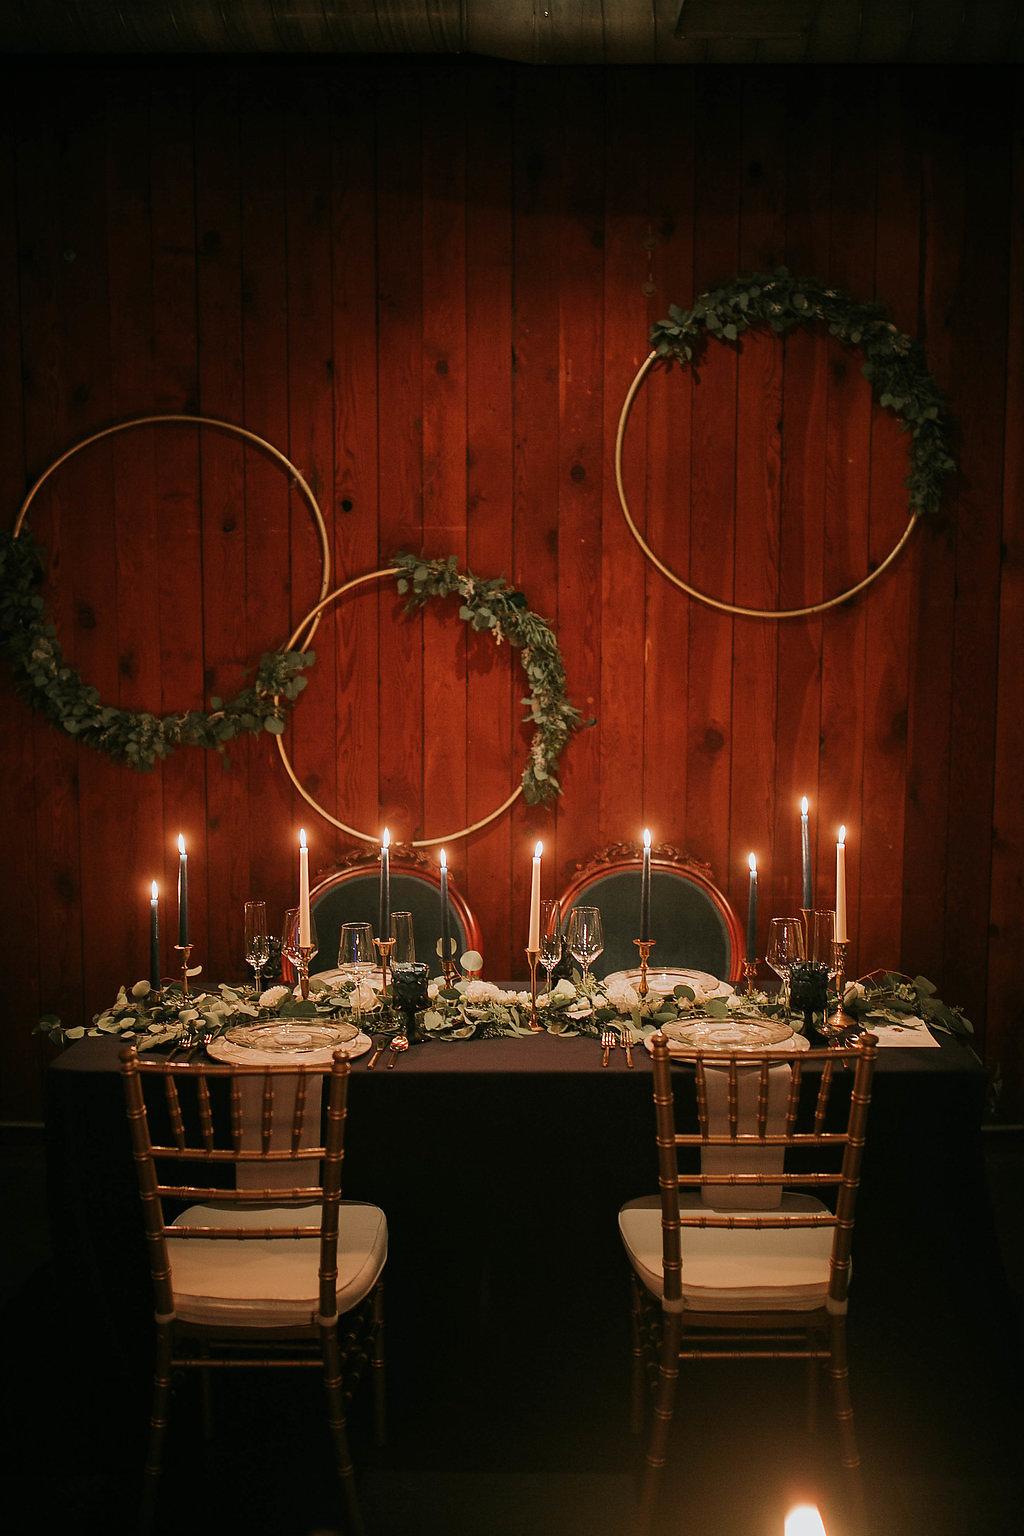 The_Big_Fake_wedding_Seattle_Within_sodo_wedding_by_Adina_Preston_Weddings_396.JPG